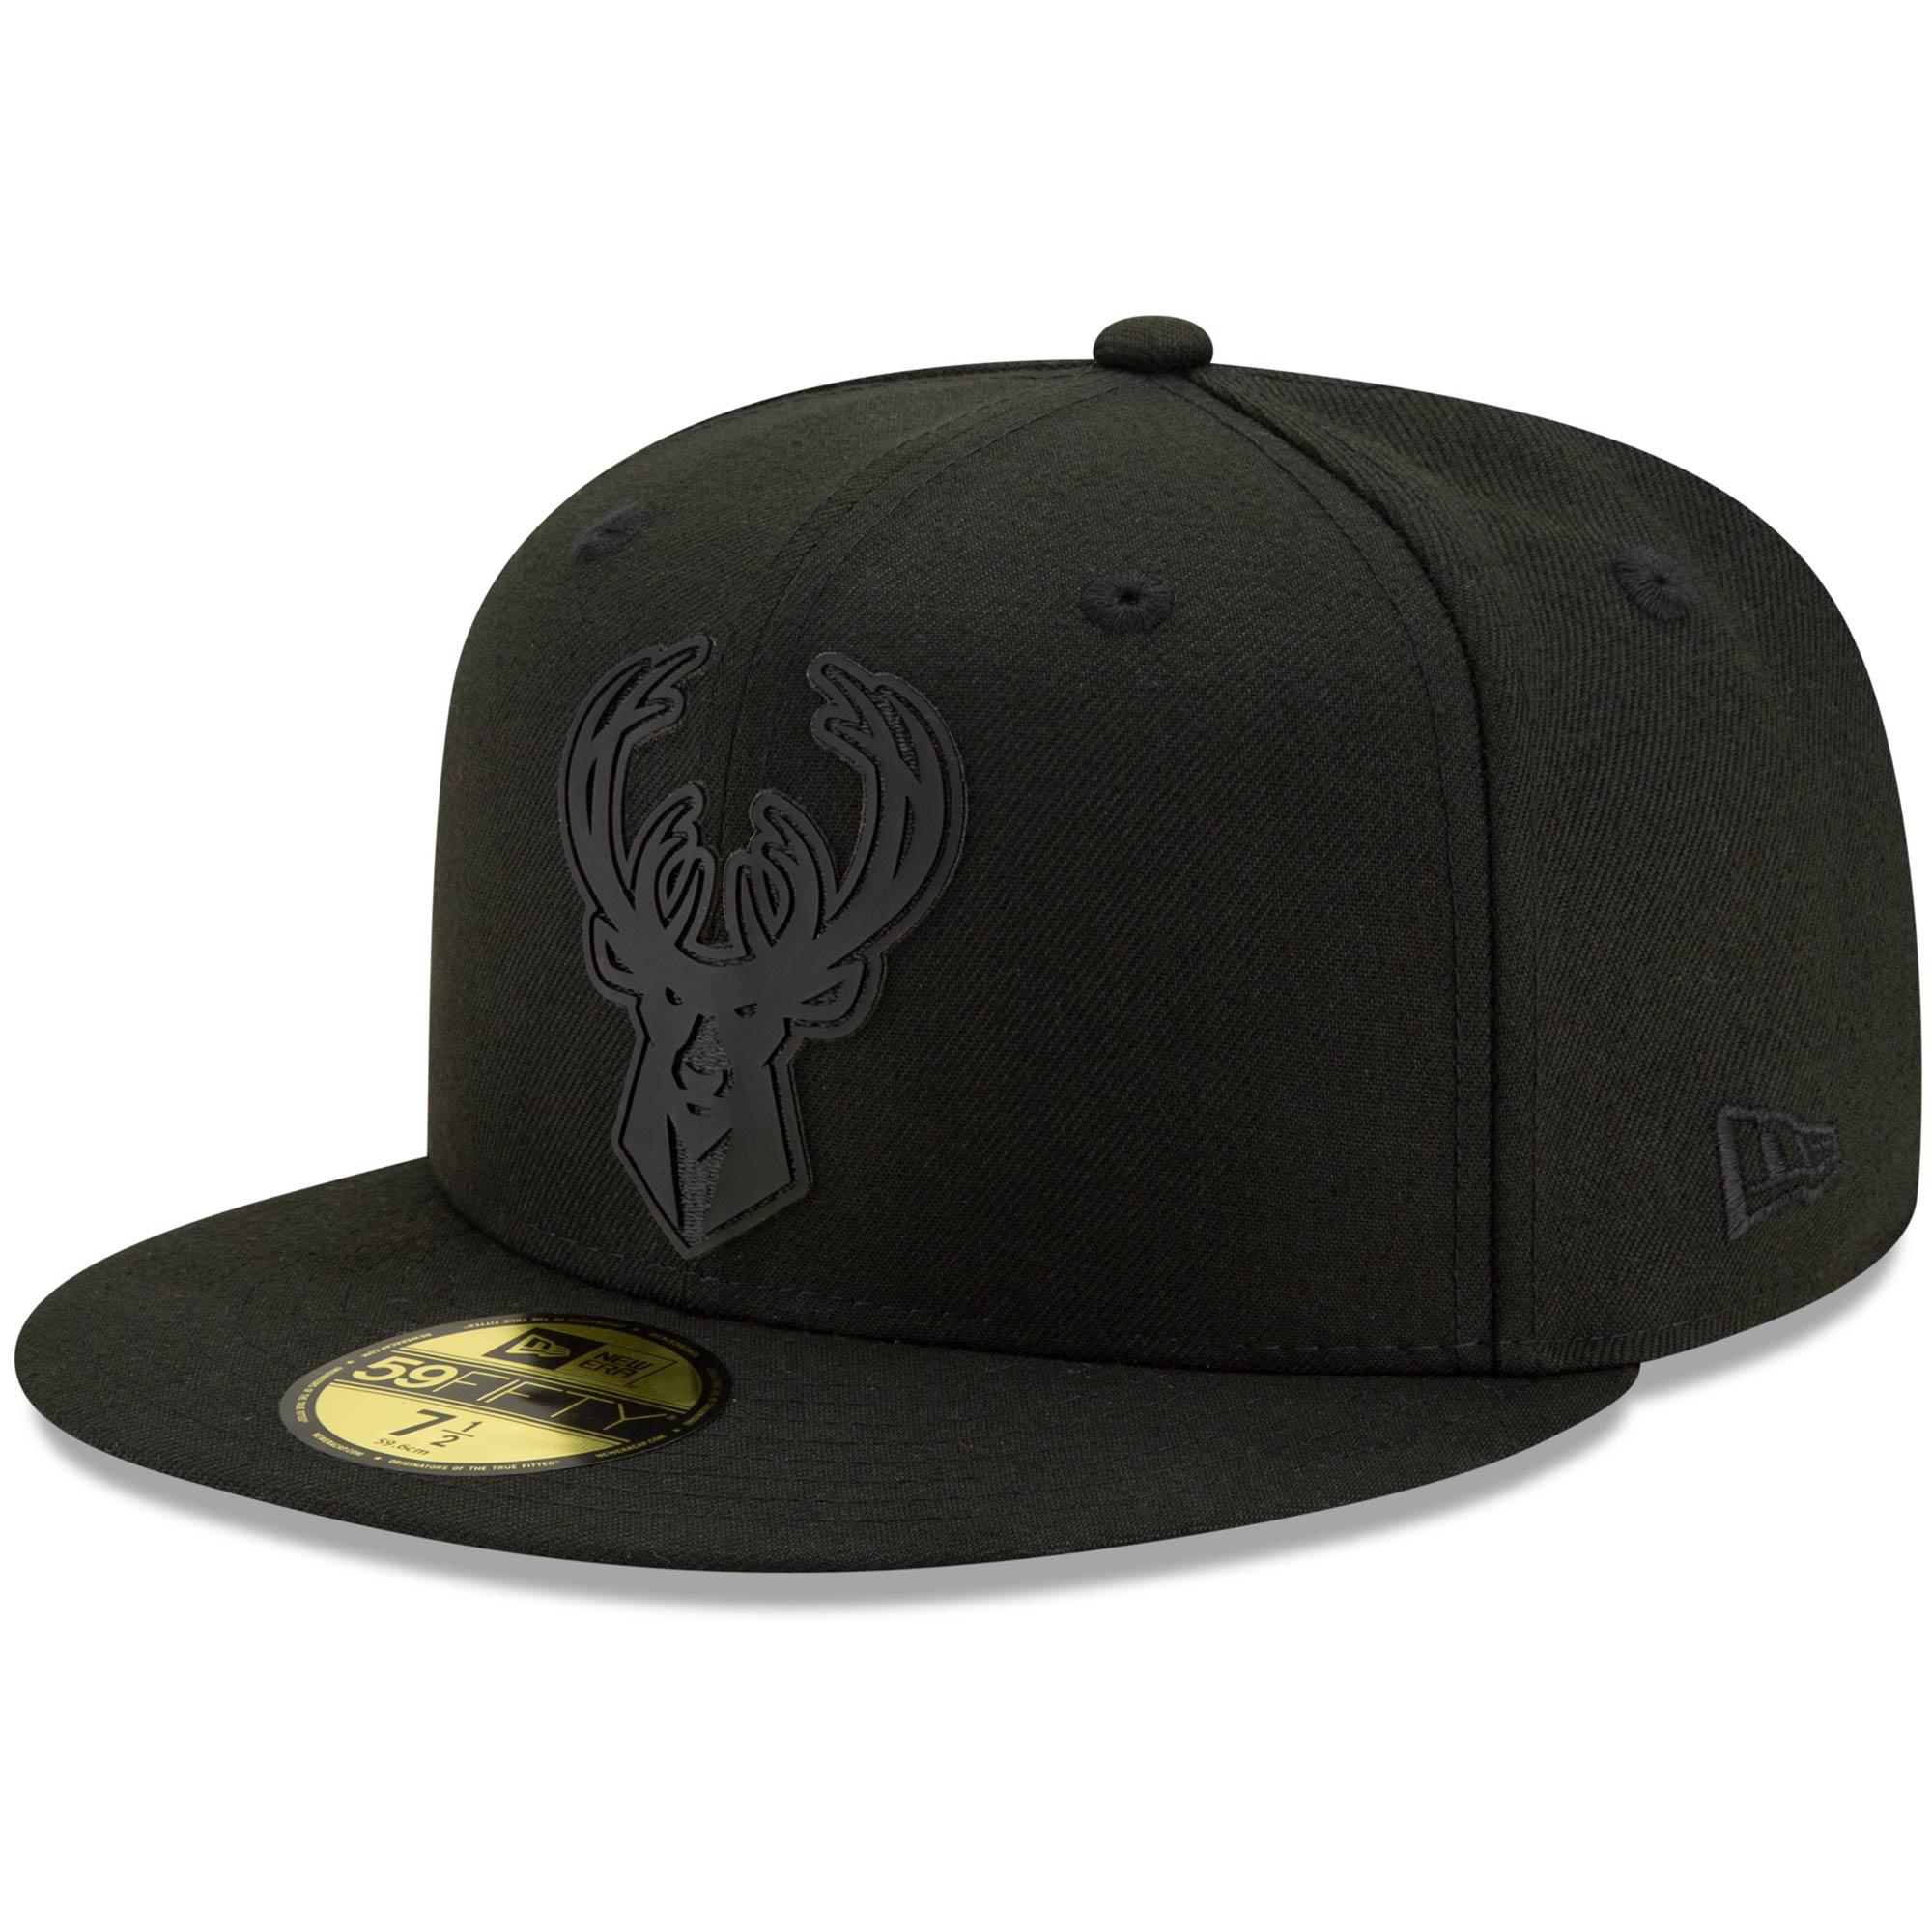 Milwaukee Bucks New Era Back Half 59FIFTY Fitted Hat - Black